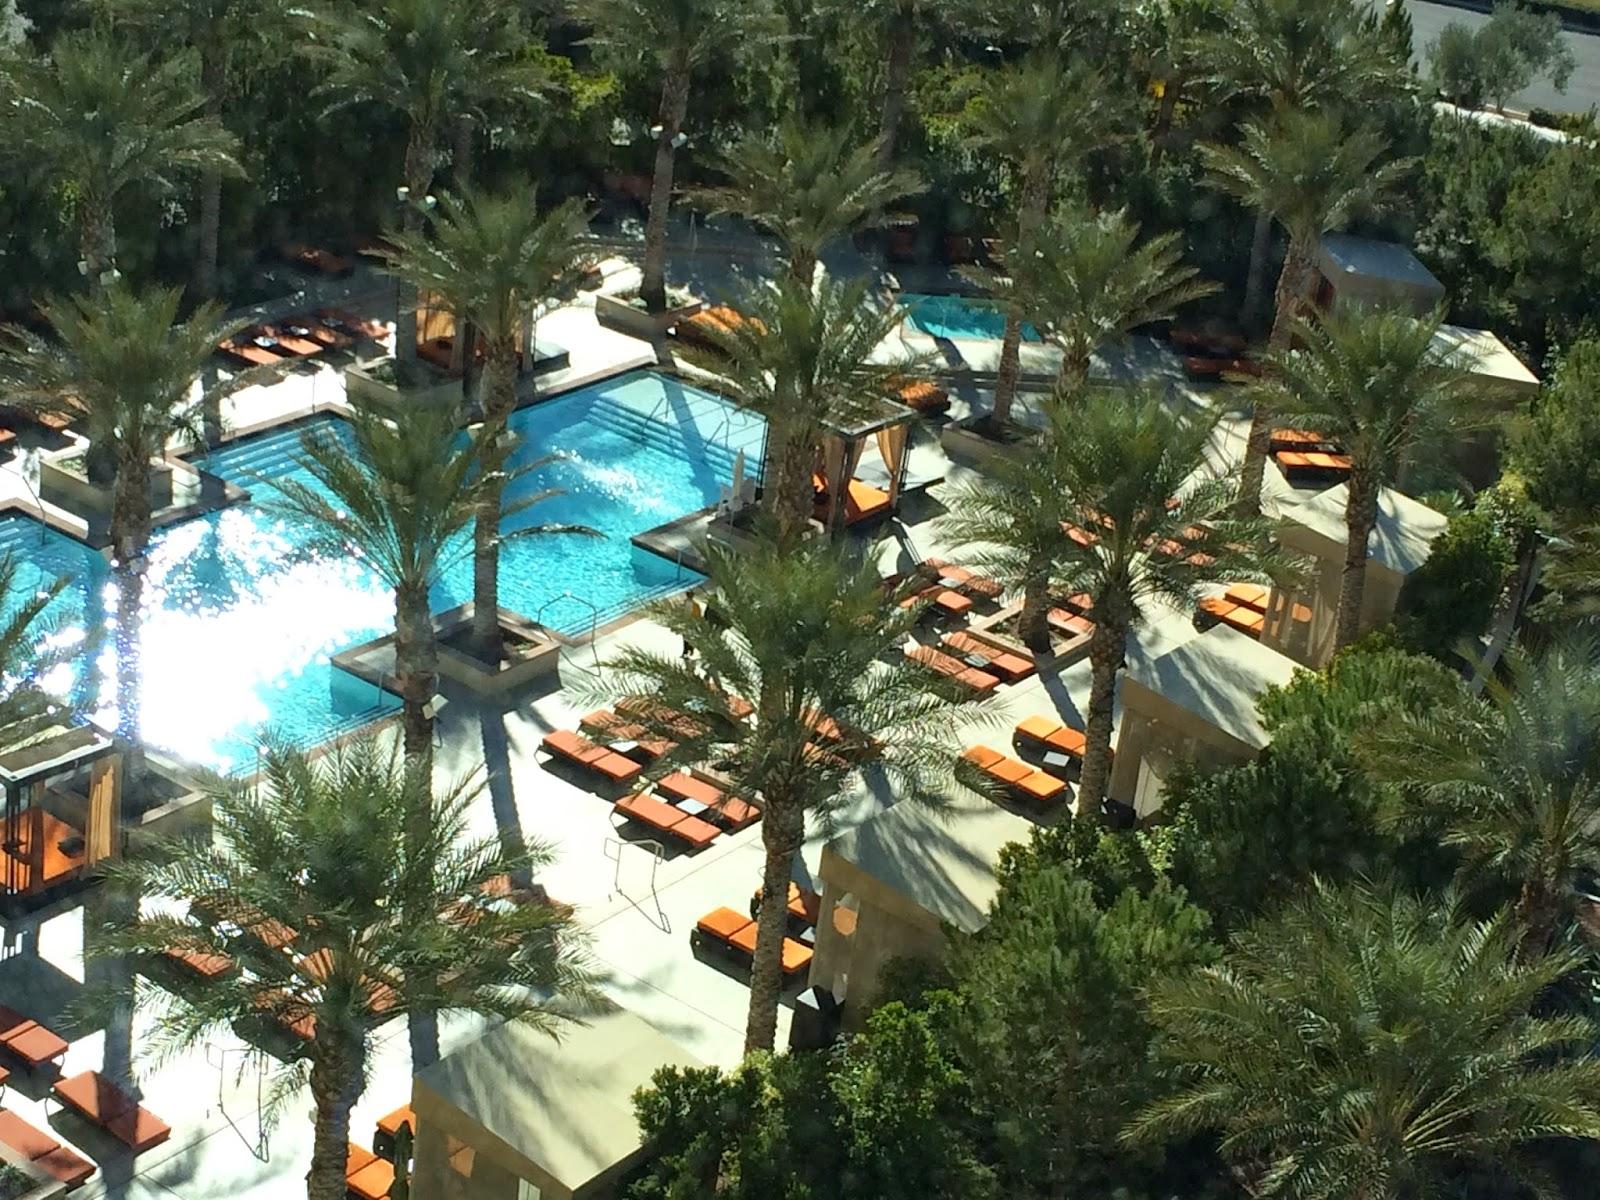 http://destinations-media.blogspot.ca/p/las-vegas-nord-aliante-hotel-et-casino.html